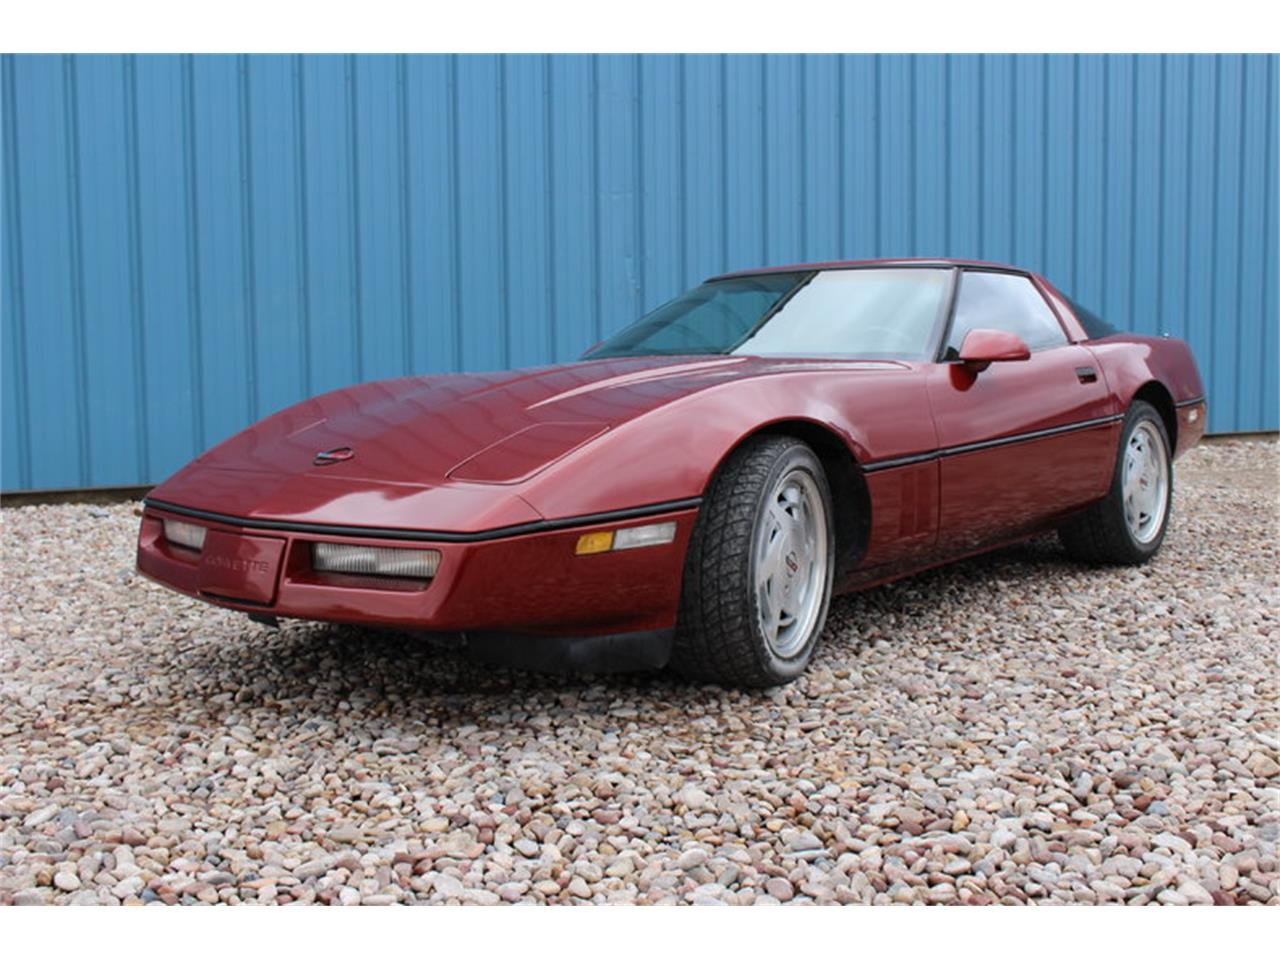 Large Picture of 1986 Corvette located in Utah - $7,995.00 - J45B